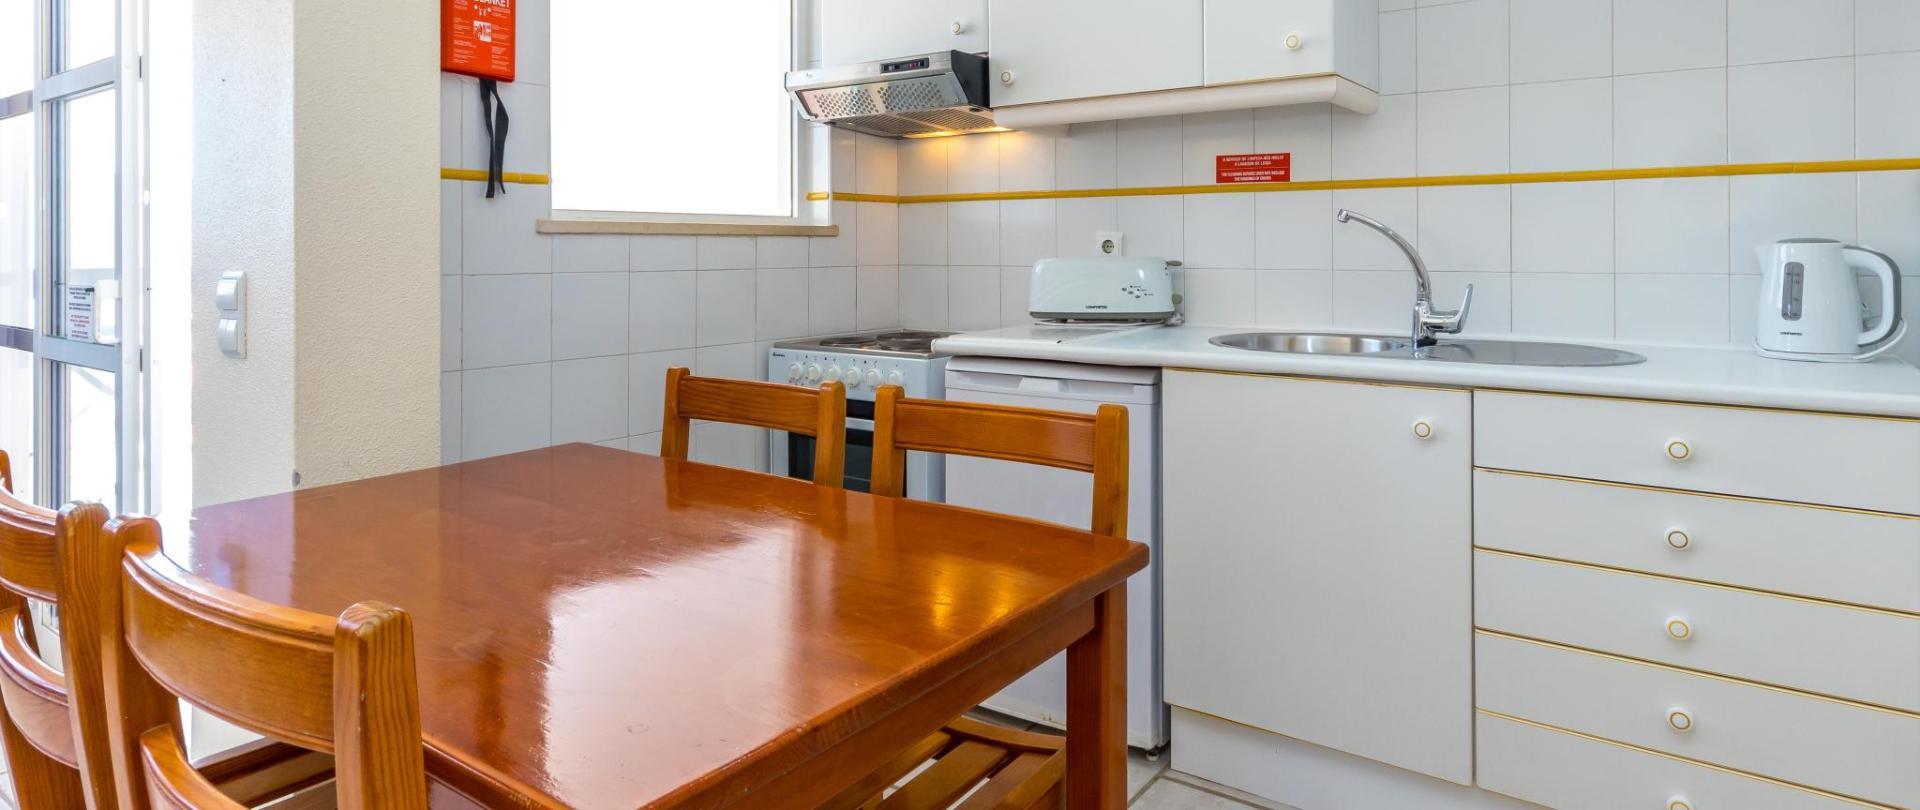 Ouratlantico - Apartamento T1 Duplex-3.jpg